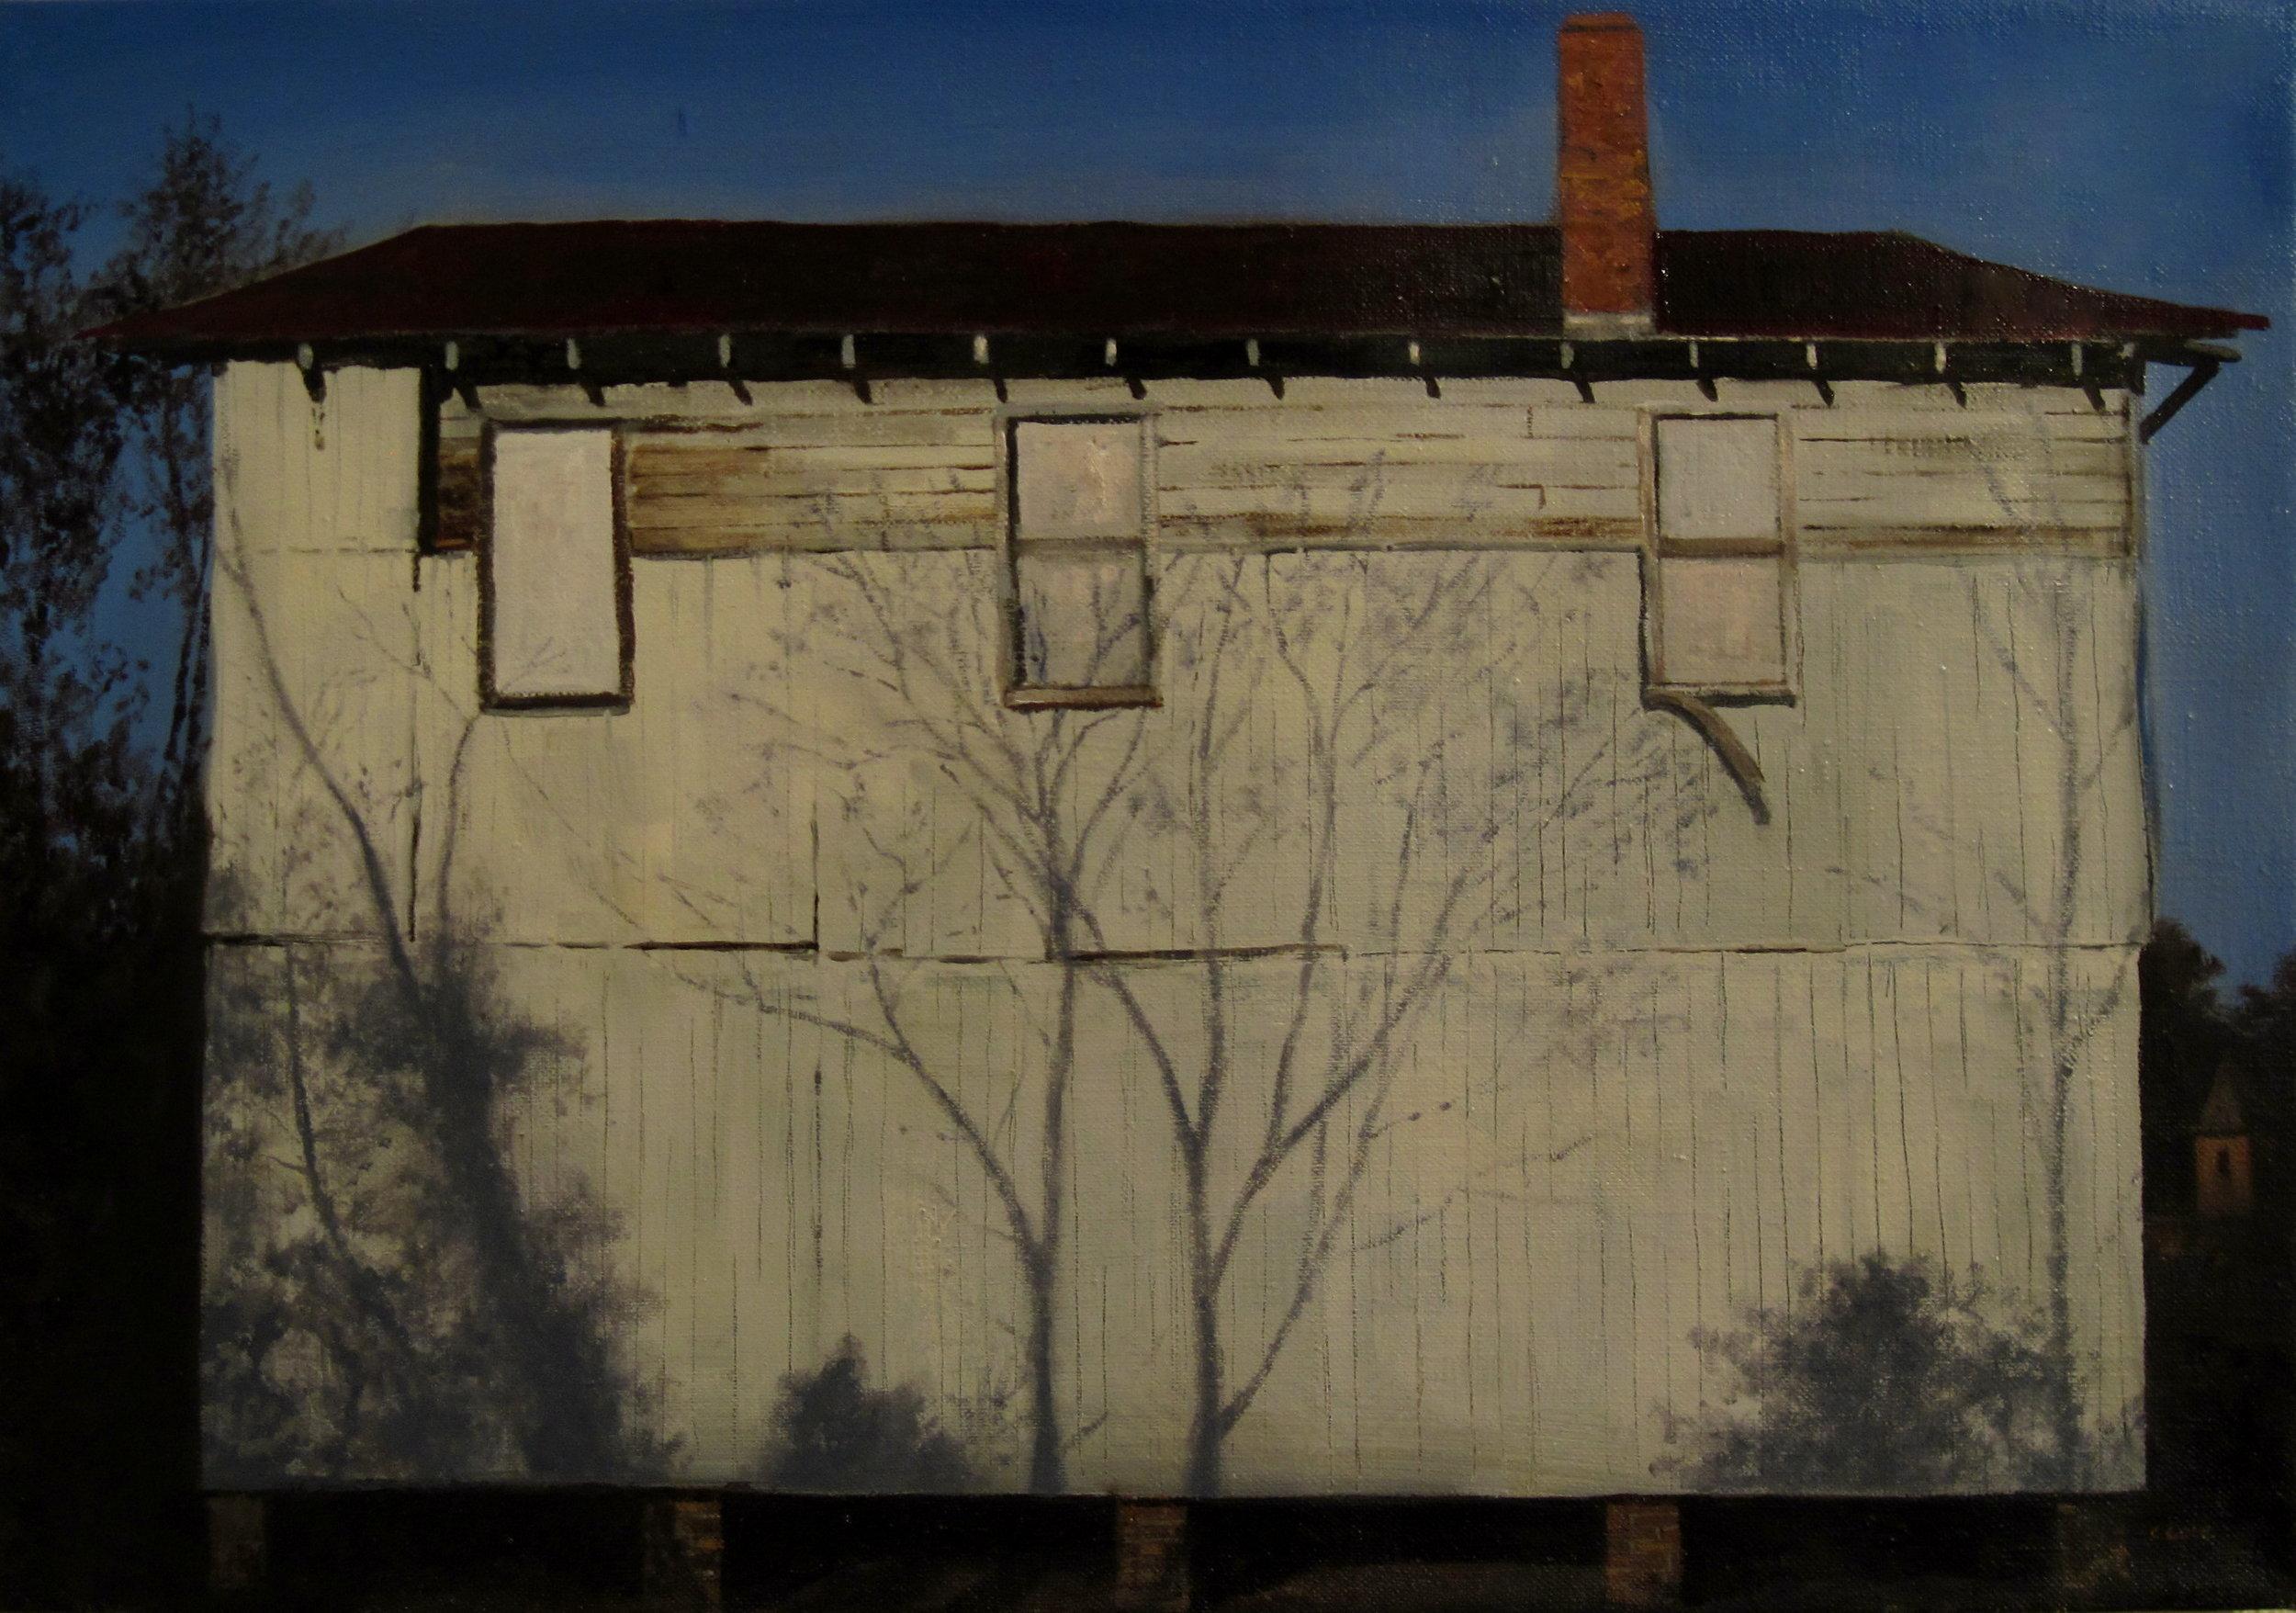 Carrsville Society Building